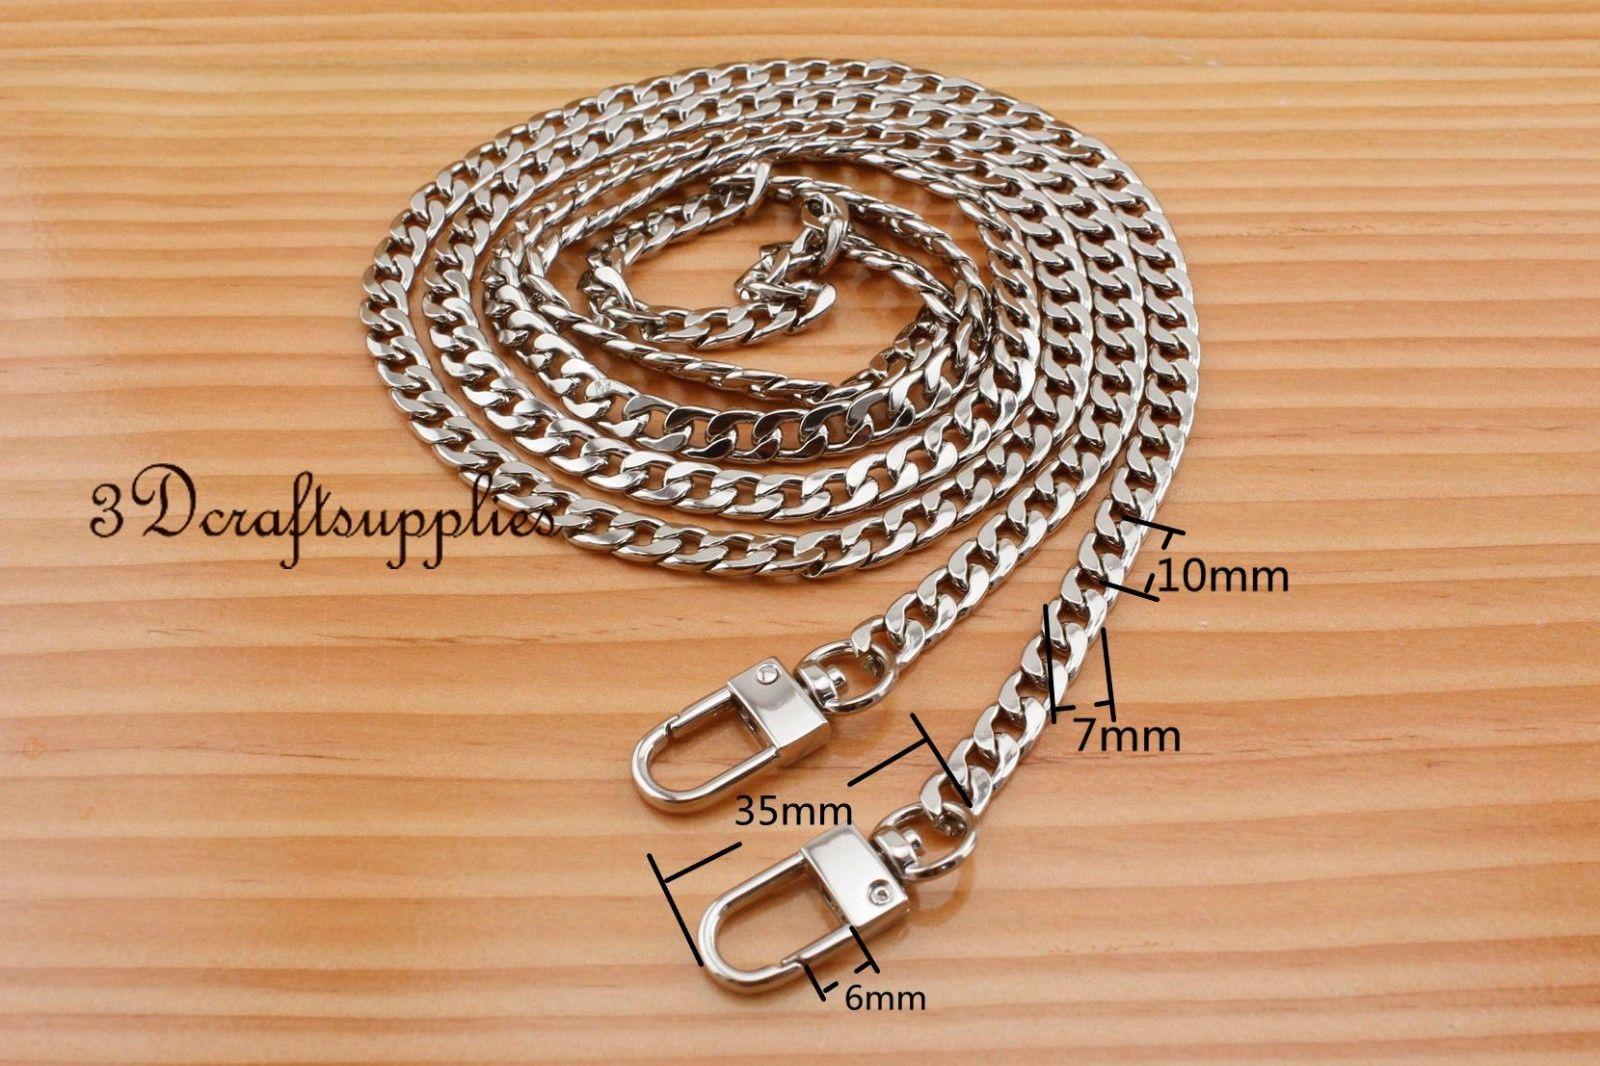 Bag chain purse chain for bag metal shoulder chain cross body strap chain nickel 140 cm CK6